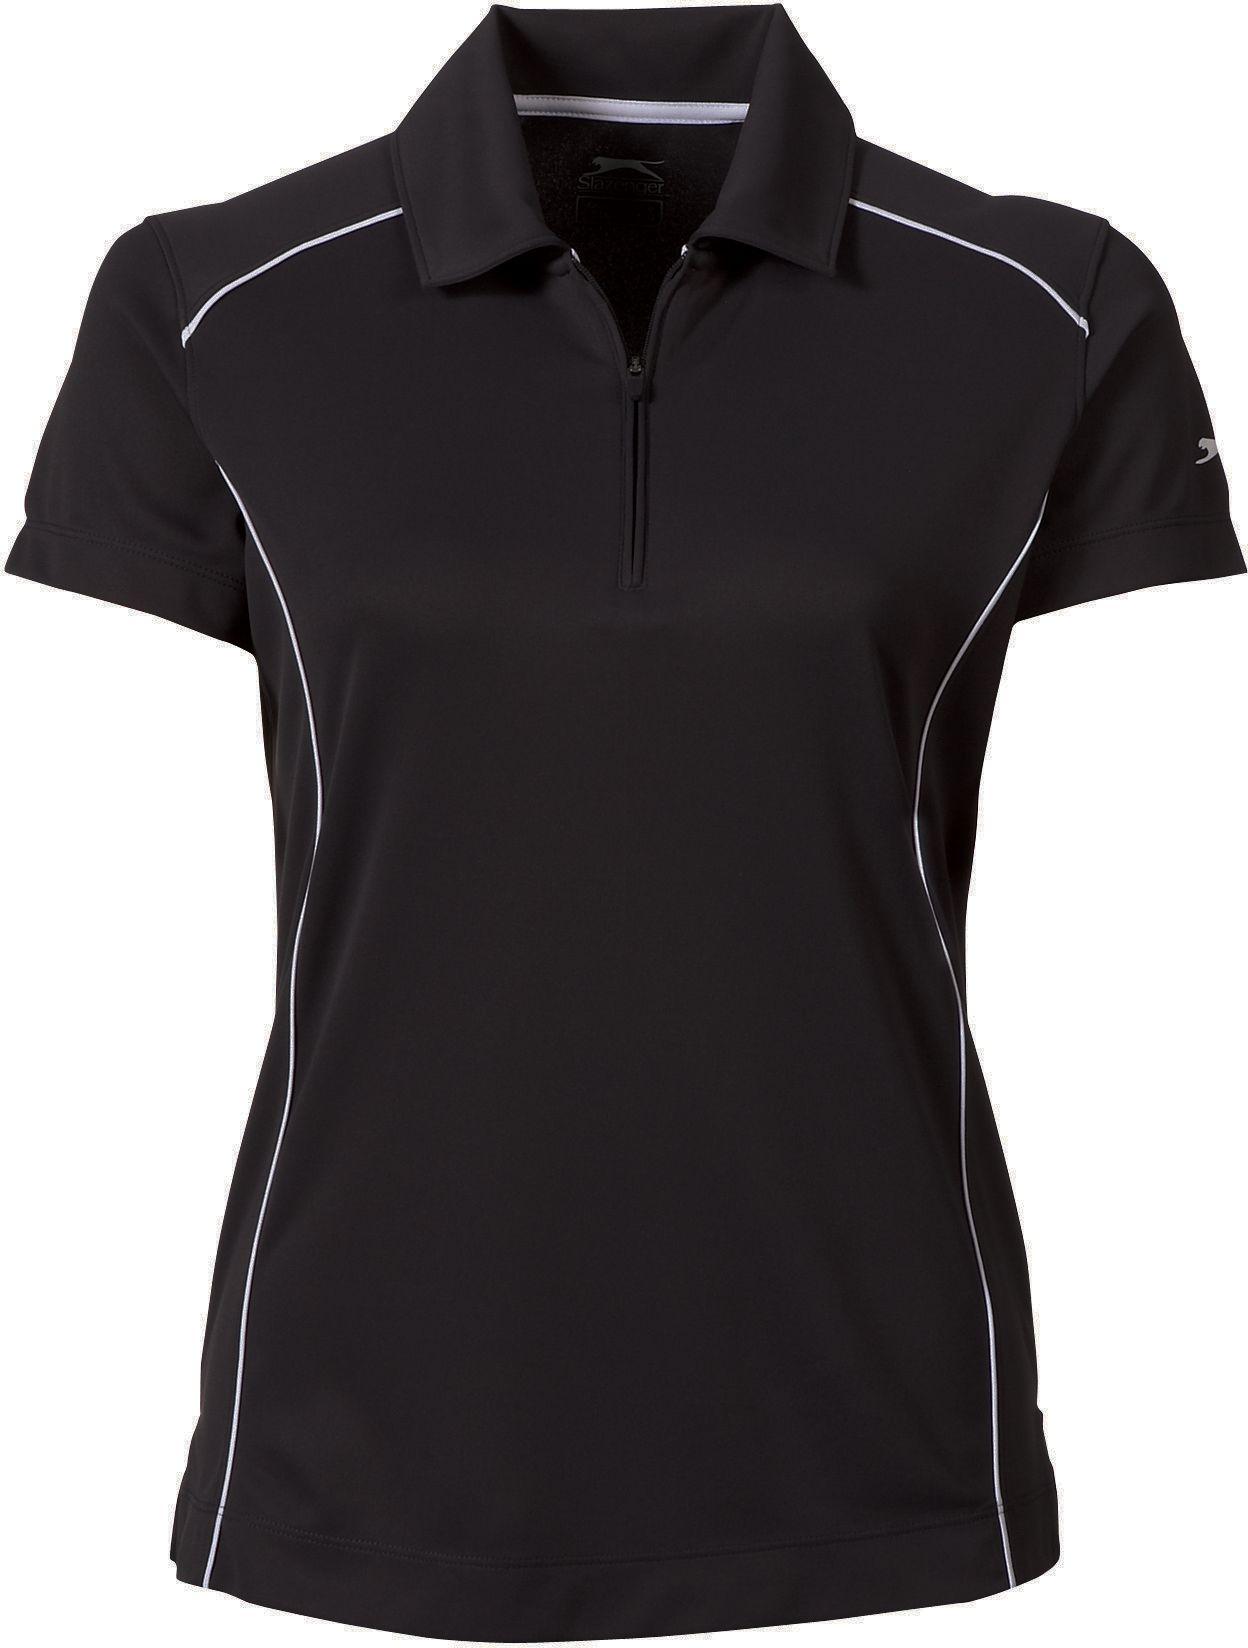 Slazenger Women's Chloe Core Short Sleeve Polo